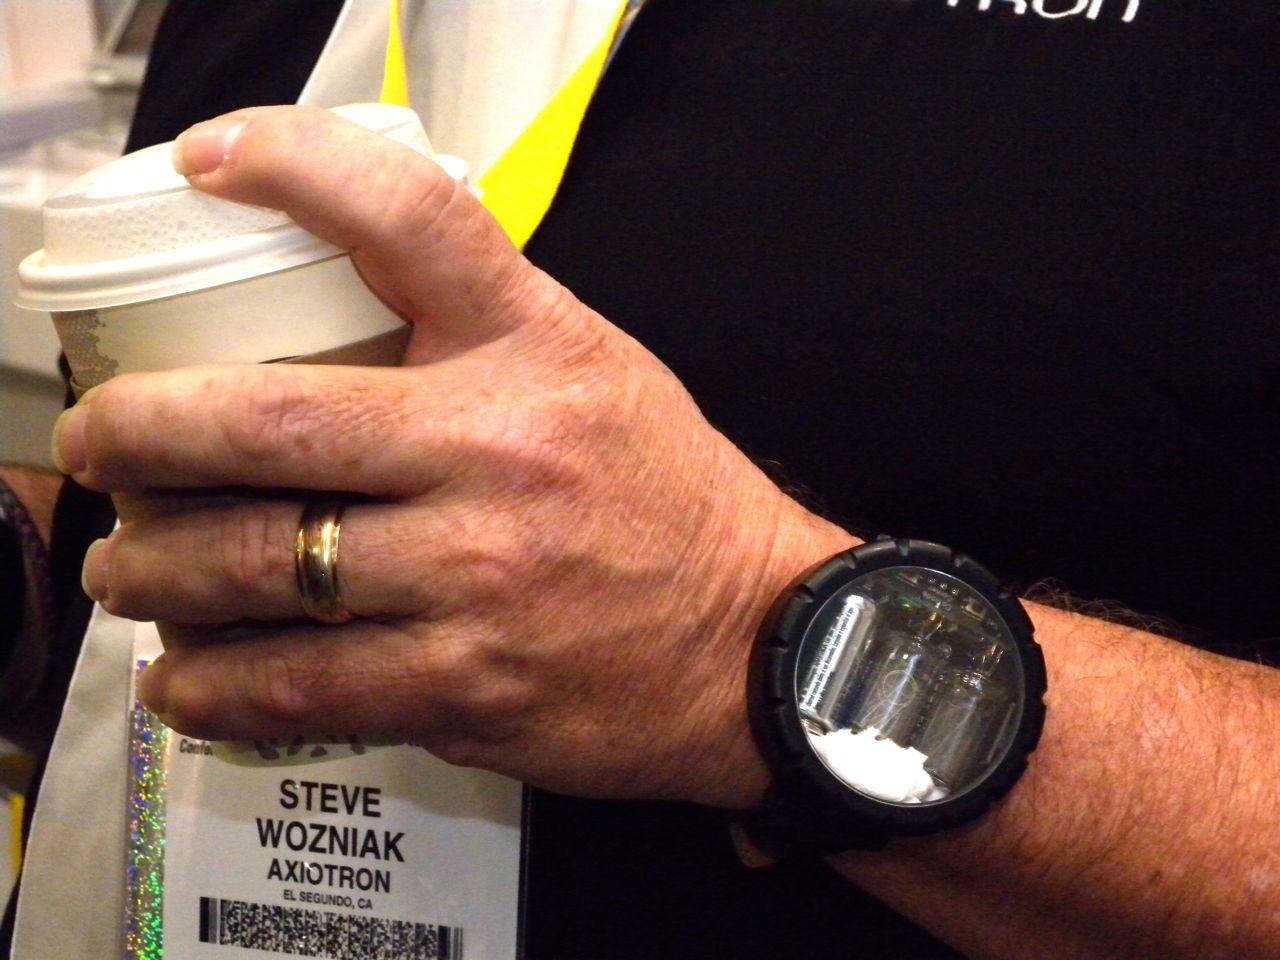 A Nixie watch on the wrist of Steve Wozniak, co-founder of Apple Inc.